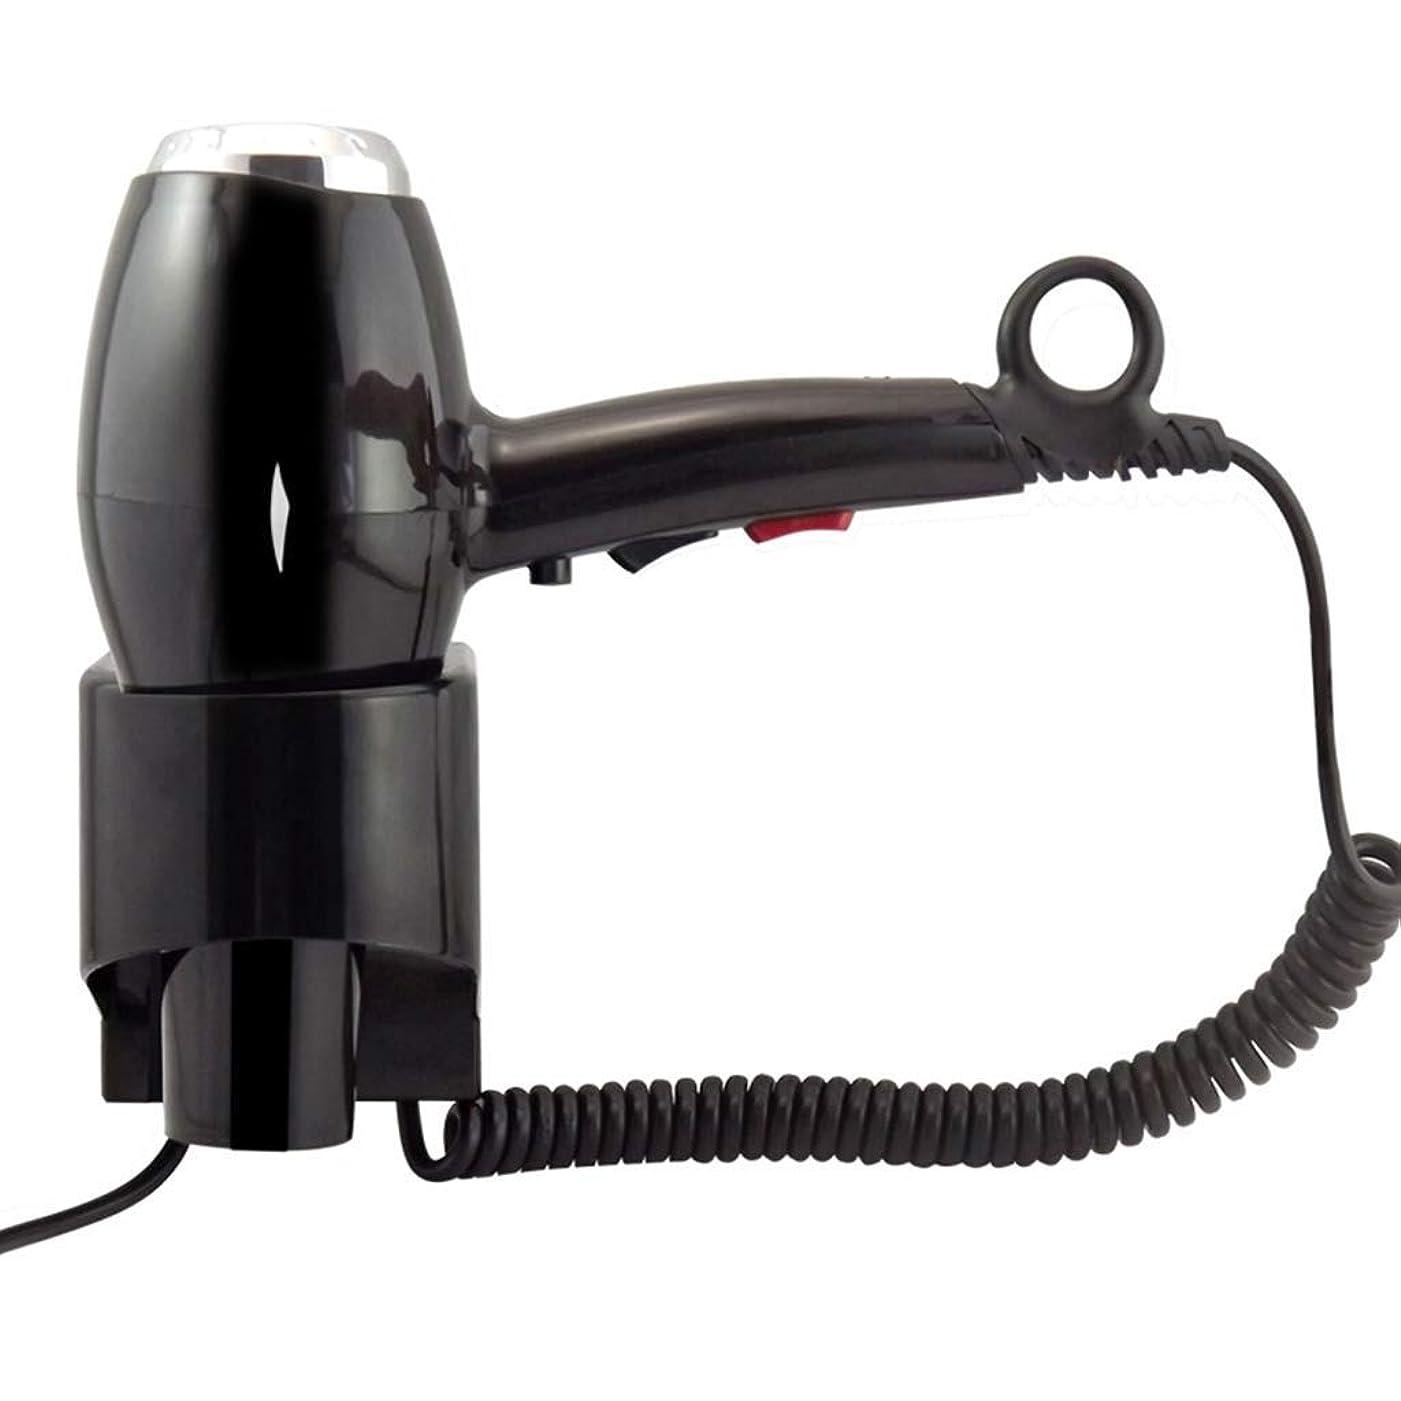 RUIMA ぶら下げヘアドライヤーバスルームホームハイパワー外部ヘアドライヤー (Color : Black)